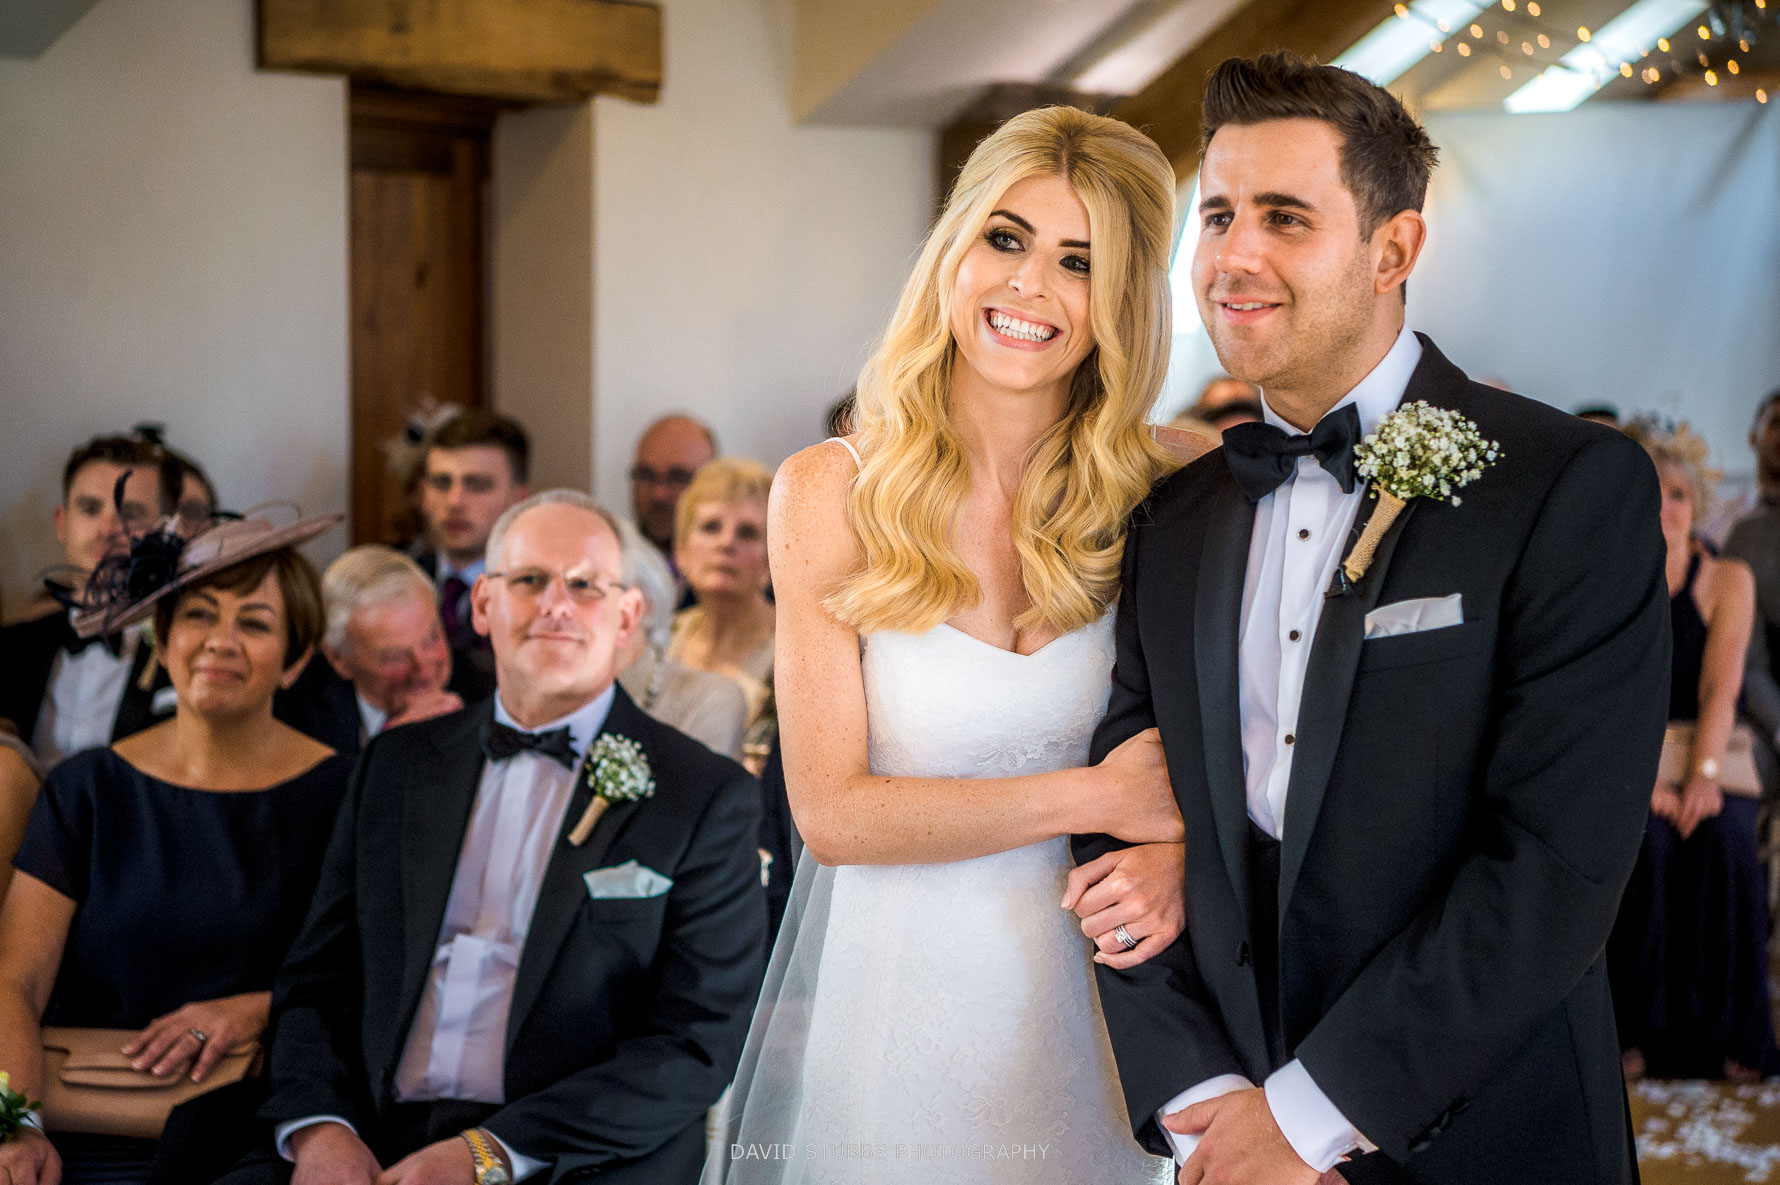 weddings at Beeston manor